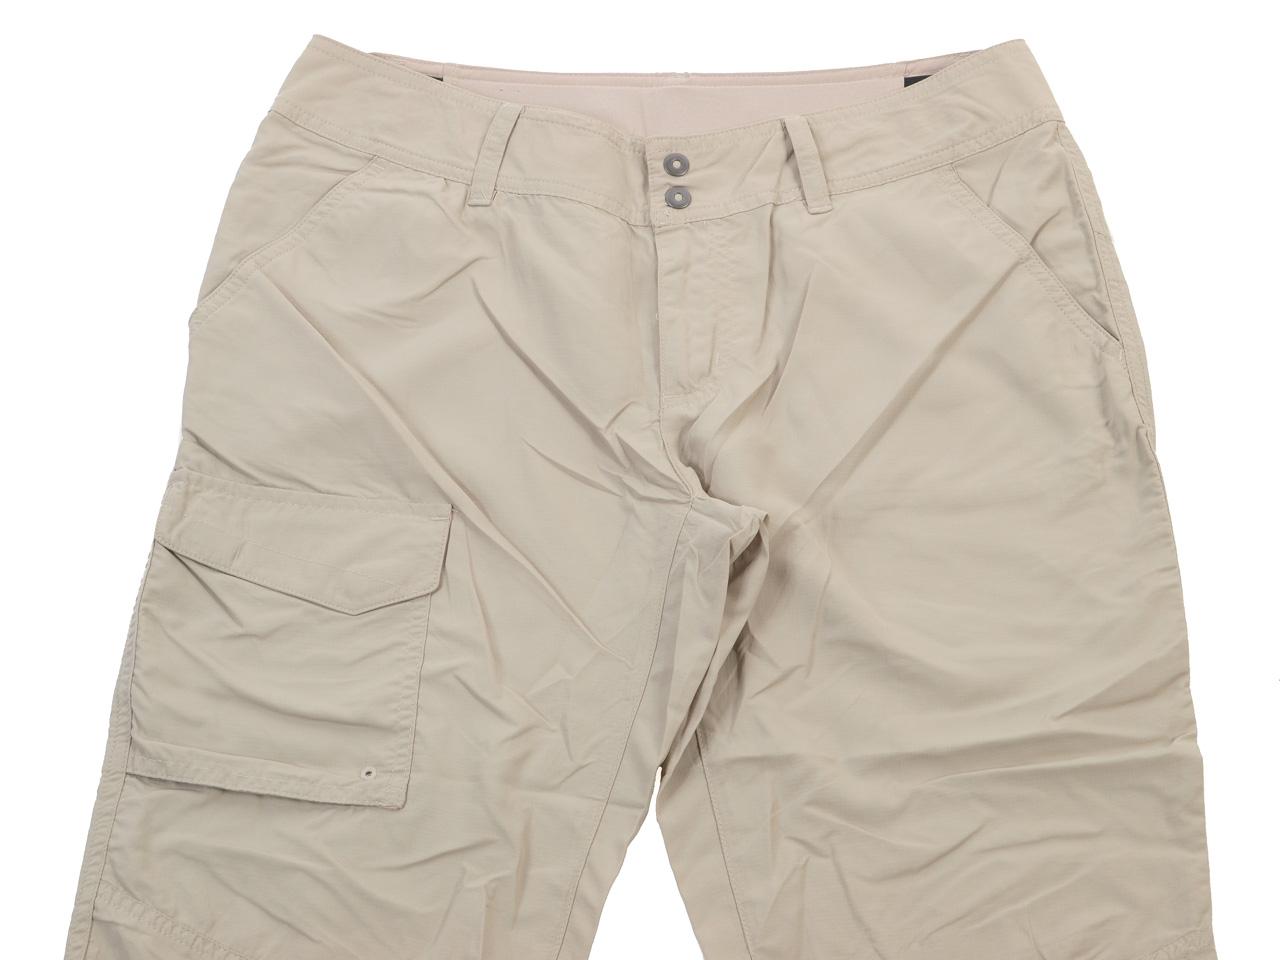 Pantalon Columbia Silver ridge foss pant l Beige 24419 - Neuf